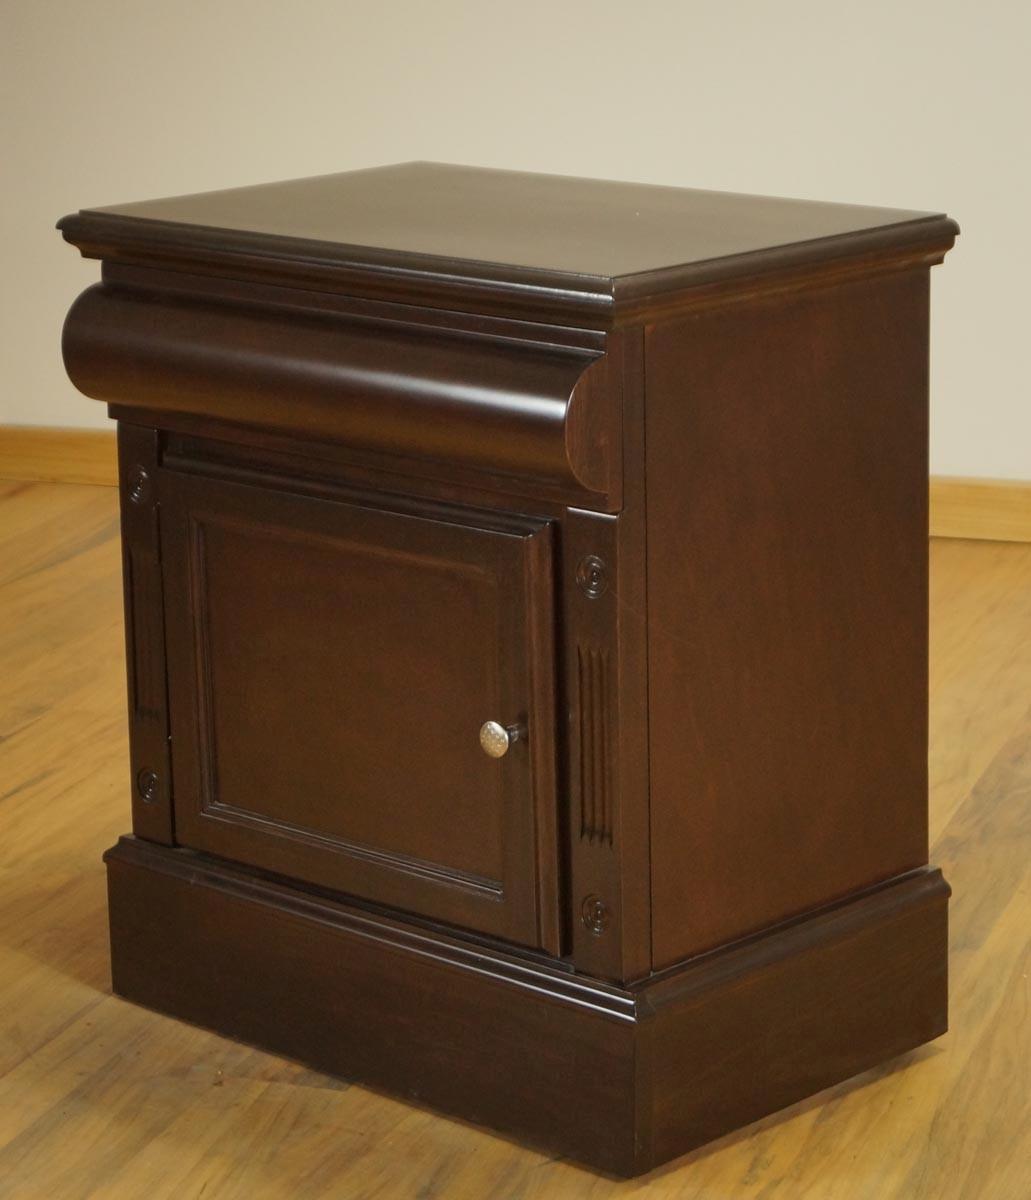 Buro de madera para recamara casa bonita muebles for Buros de cama modernos